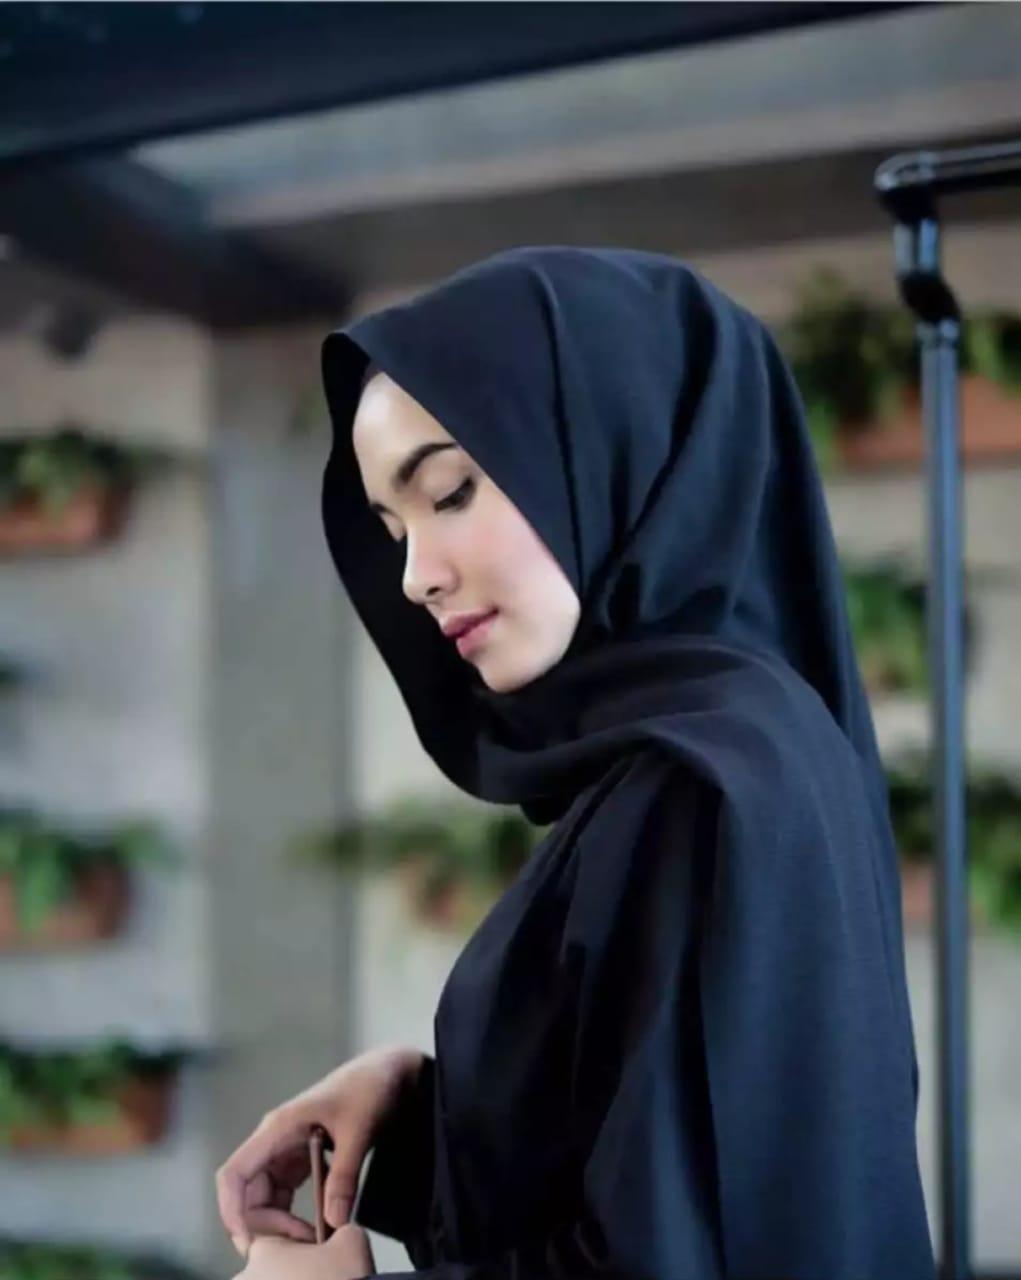 VICTORIOUS pashmina annisa / pashmina diamond / pashminas instan/ pashminas kekinian/ pashmina terbaru/ jilbab pashmina muslim/ jilbab terbaru/